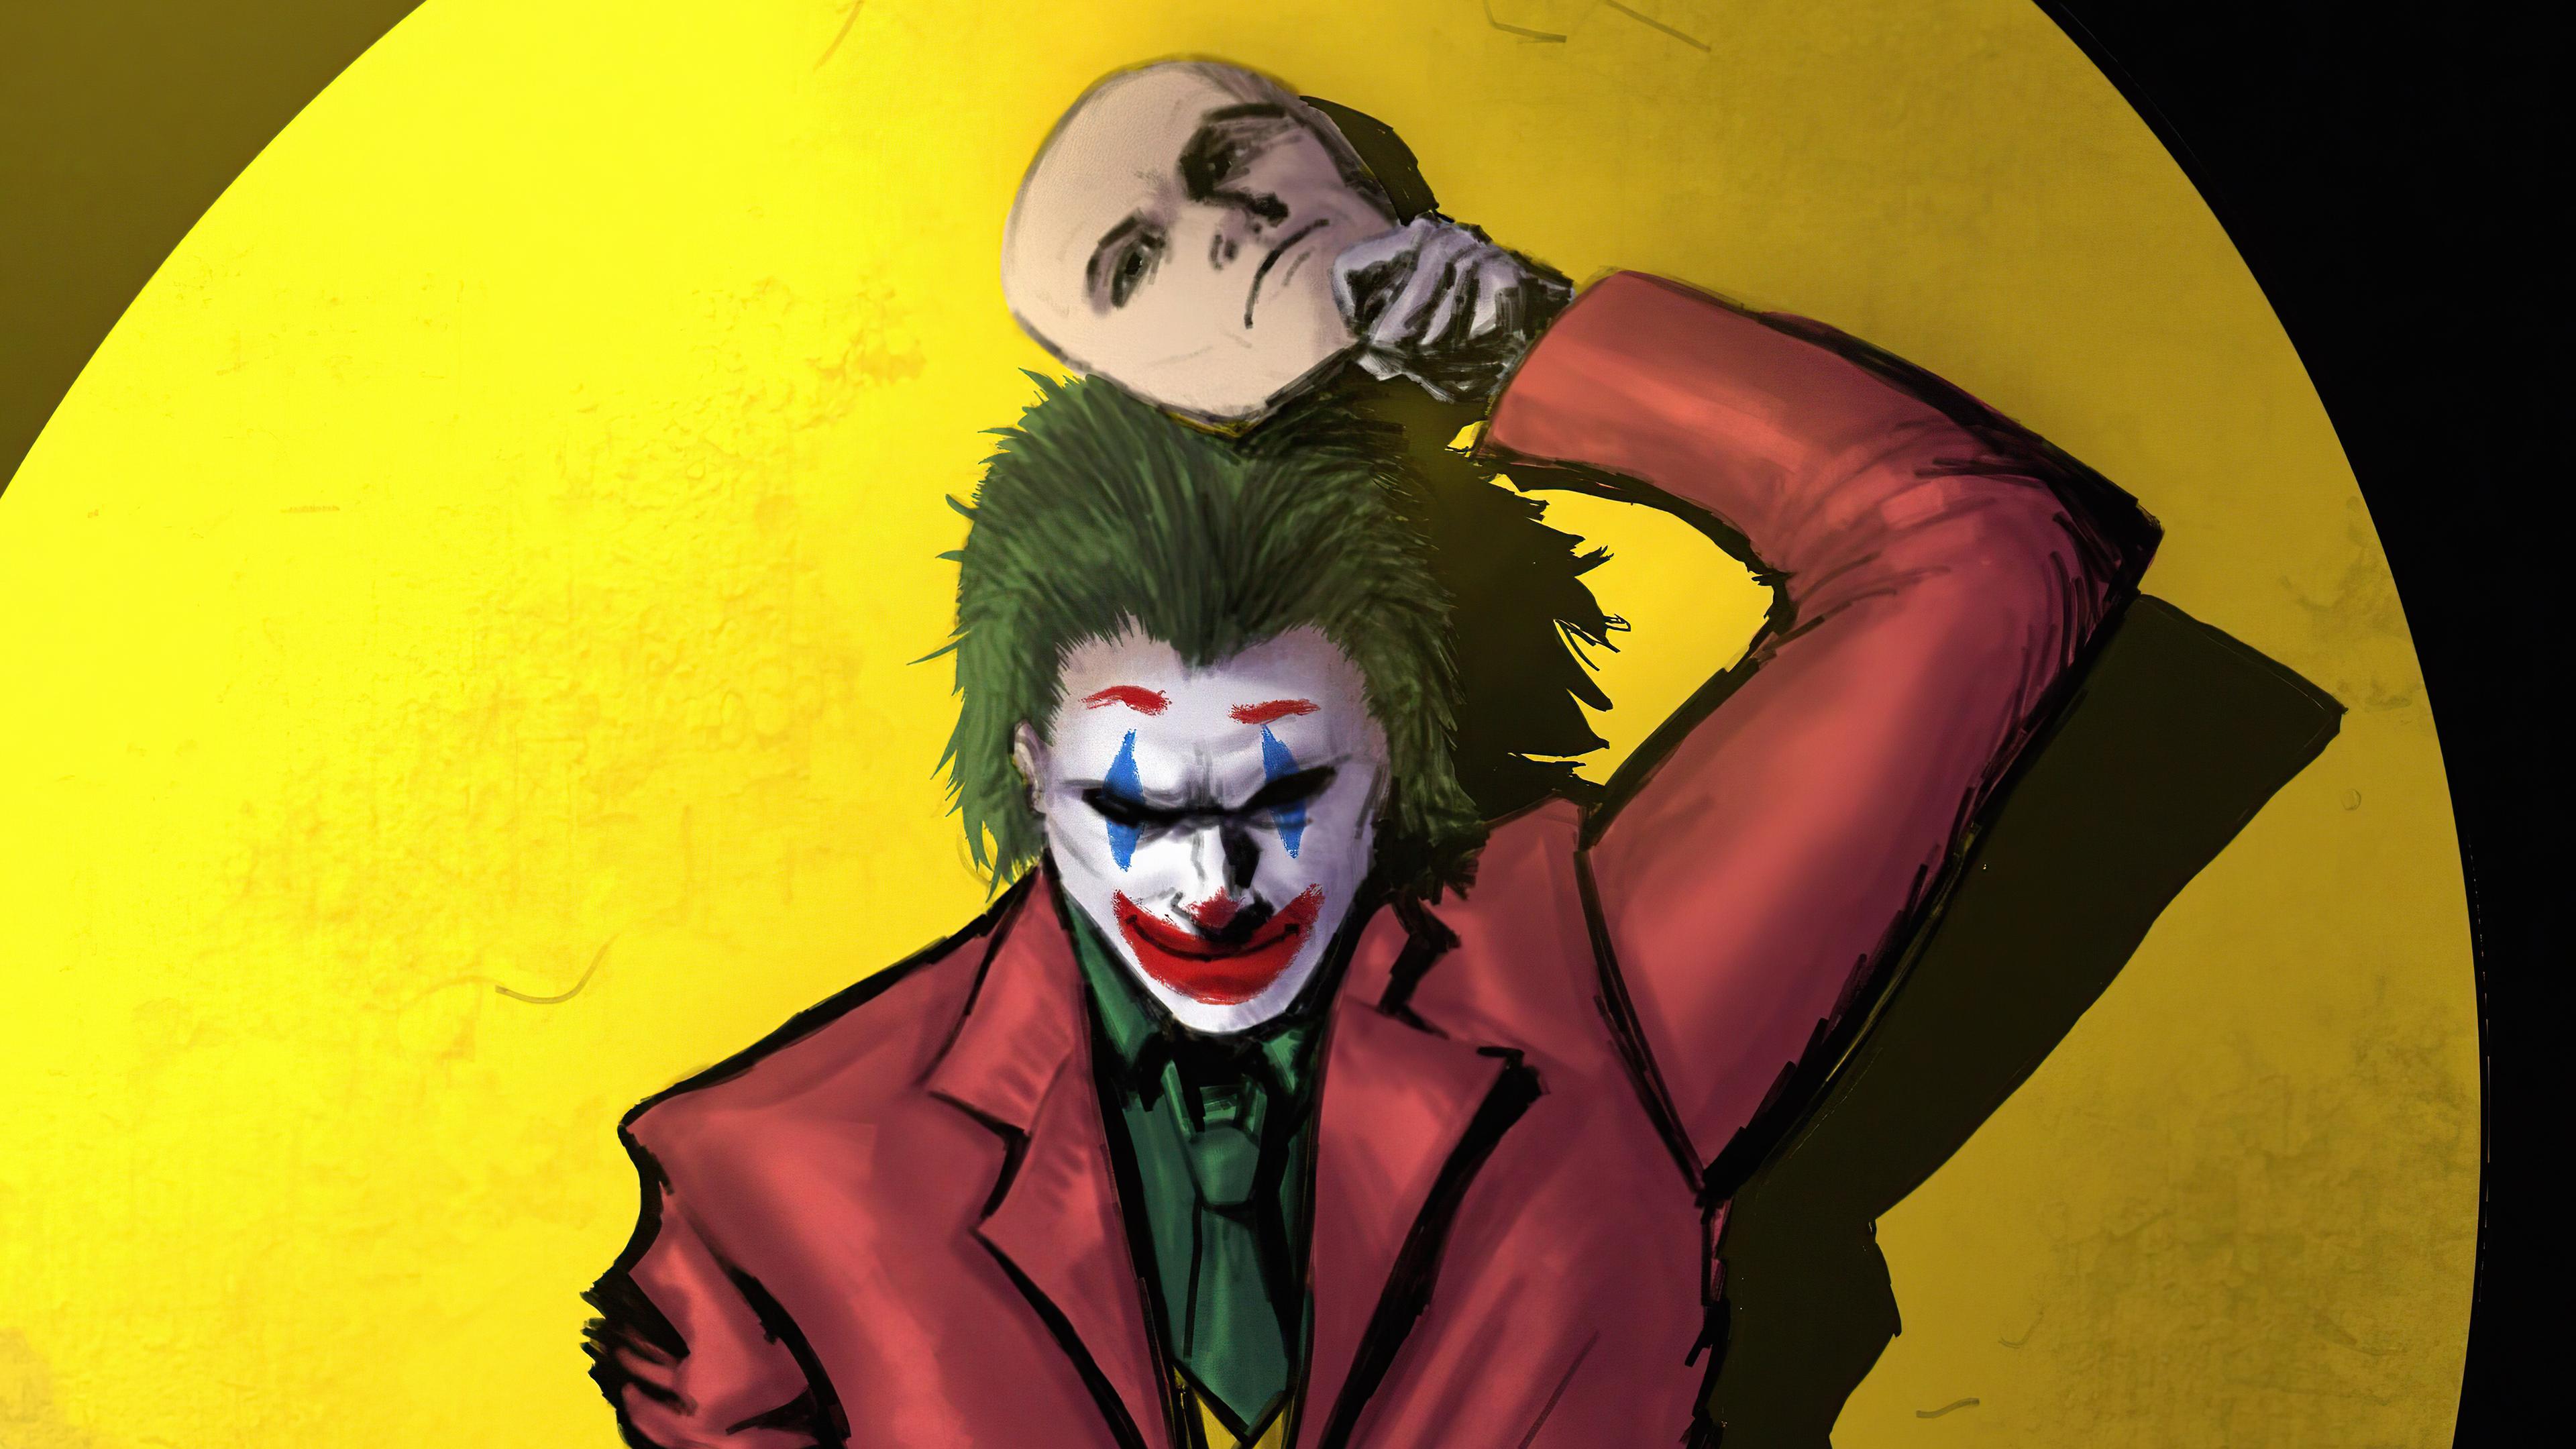 joker joaquinphoenix 4k 1616956386 - Joker Joaquinphoenix 4k - Joker Joaquinphoenix 4k wallpapers